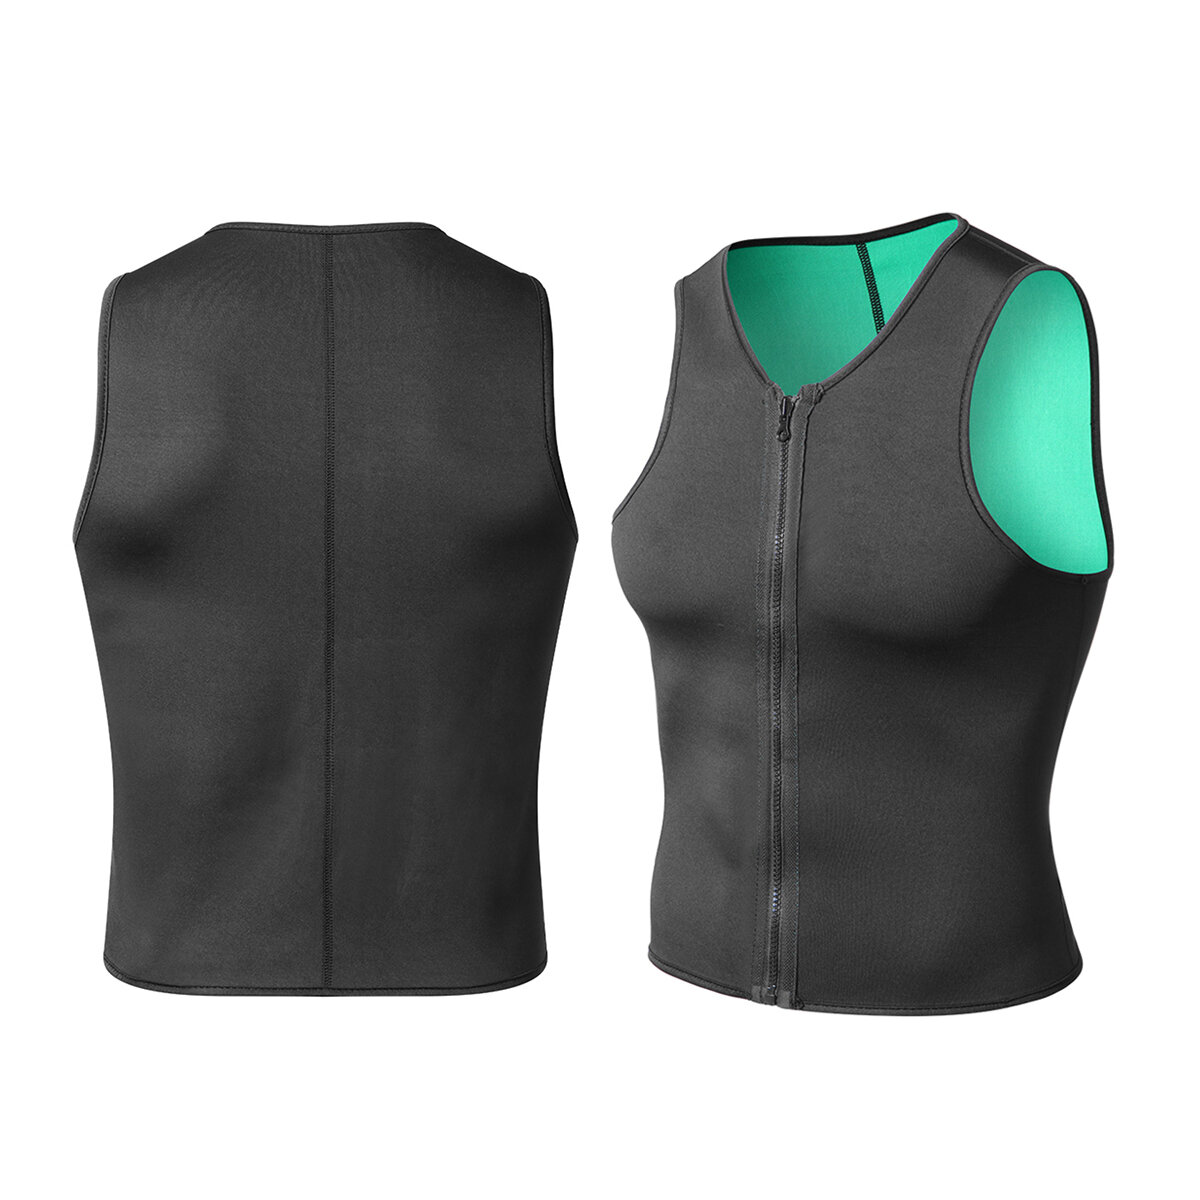 Neoprene Body Shaper Slimming Slim Sweat Trainer Yoga Gym Cincher Vest Shapewear